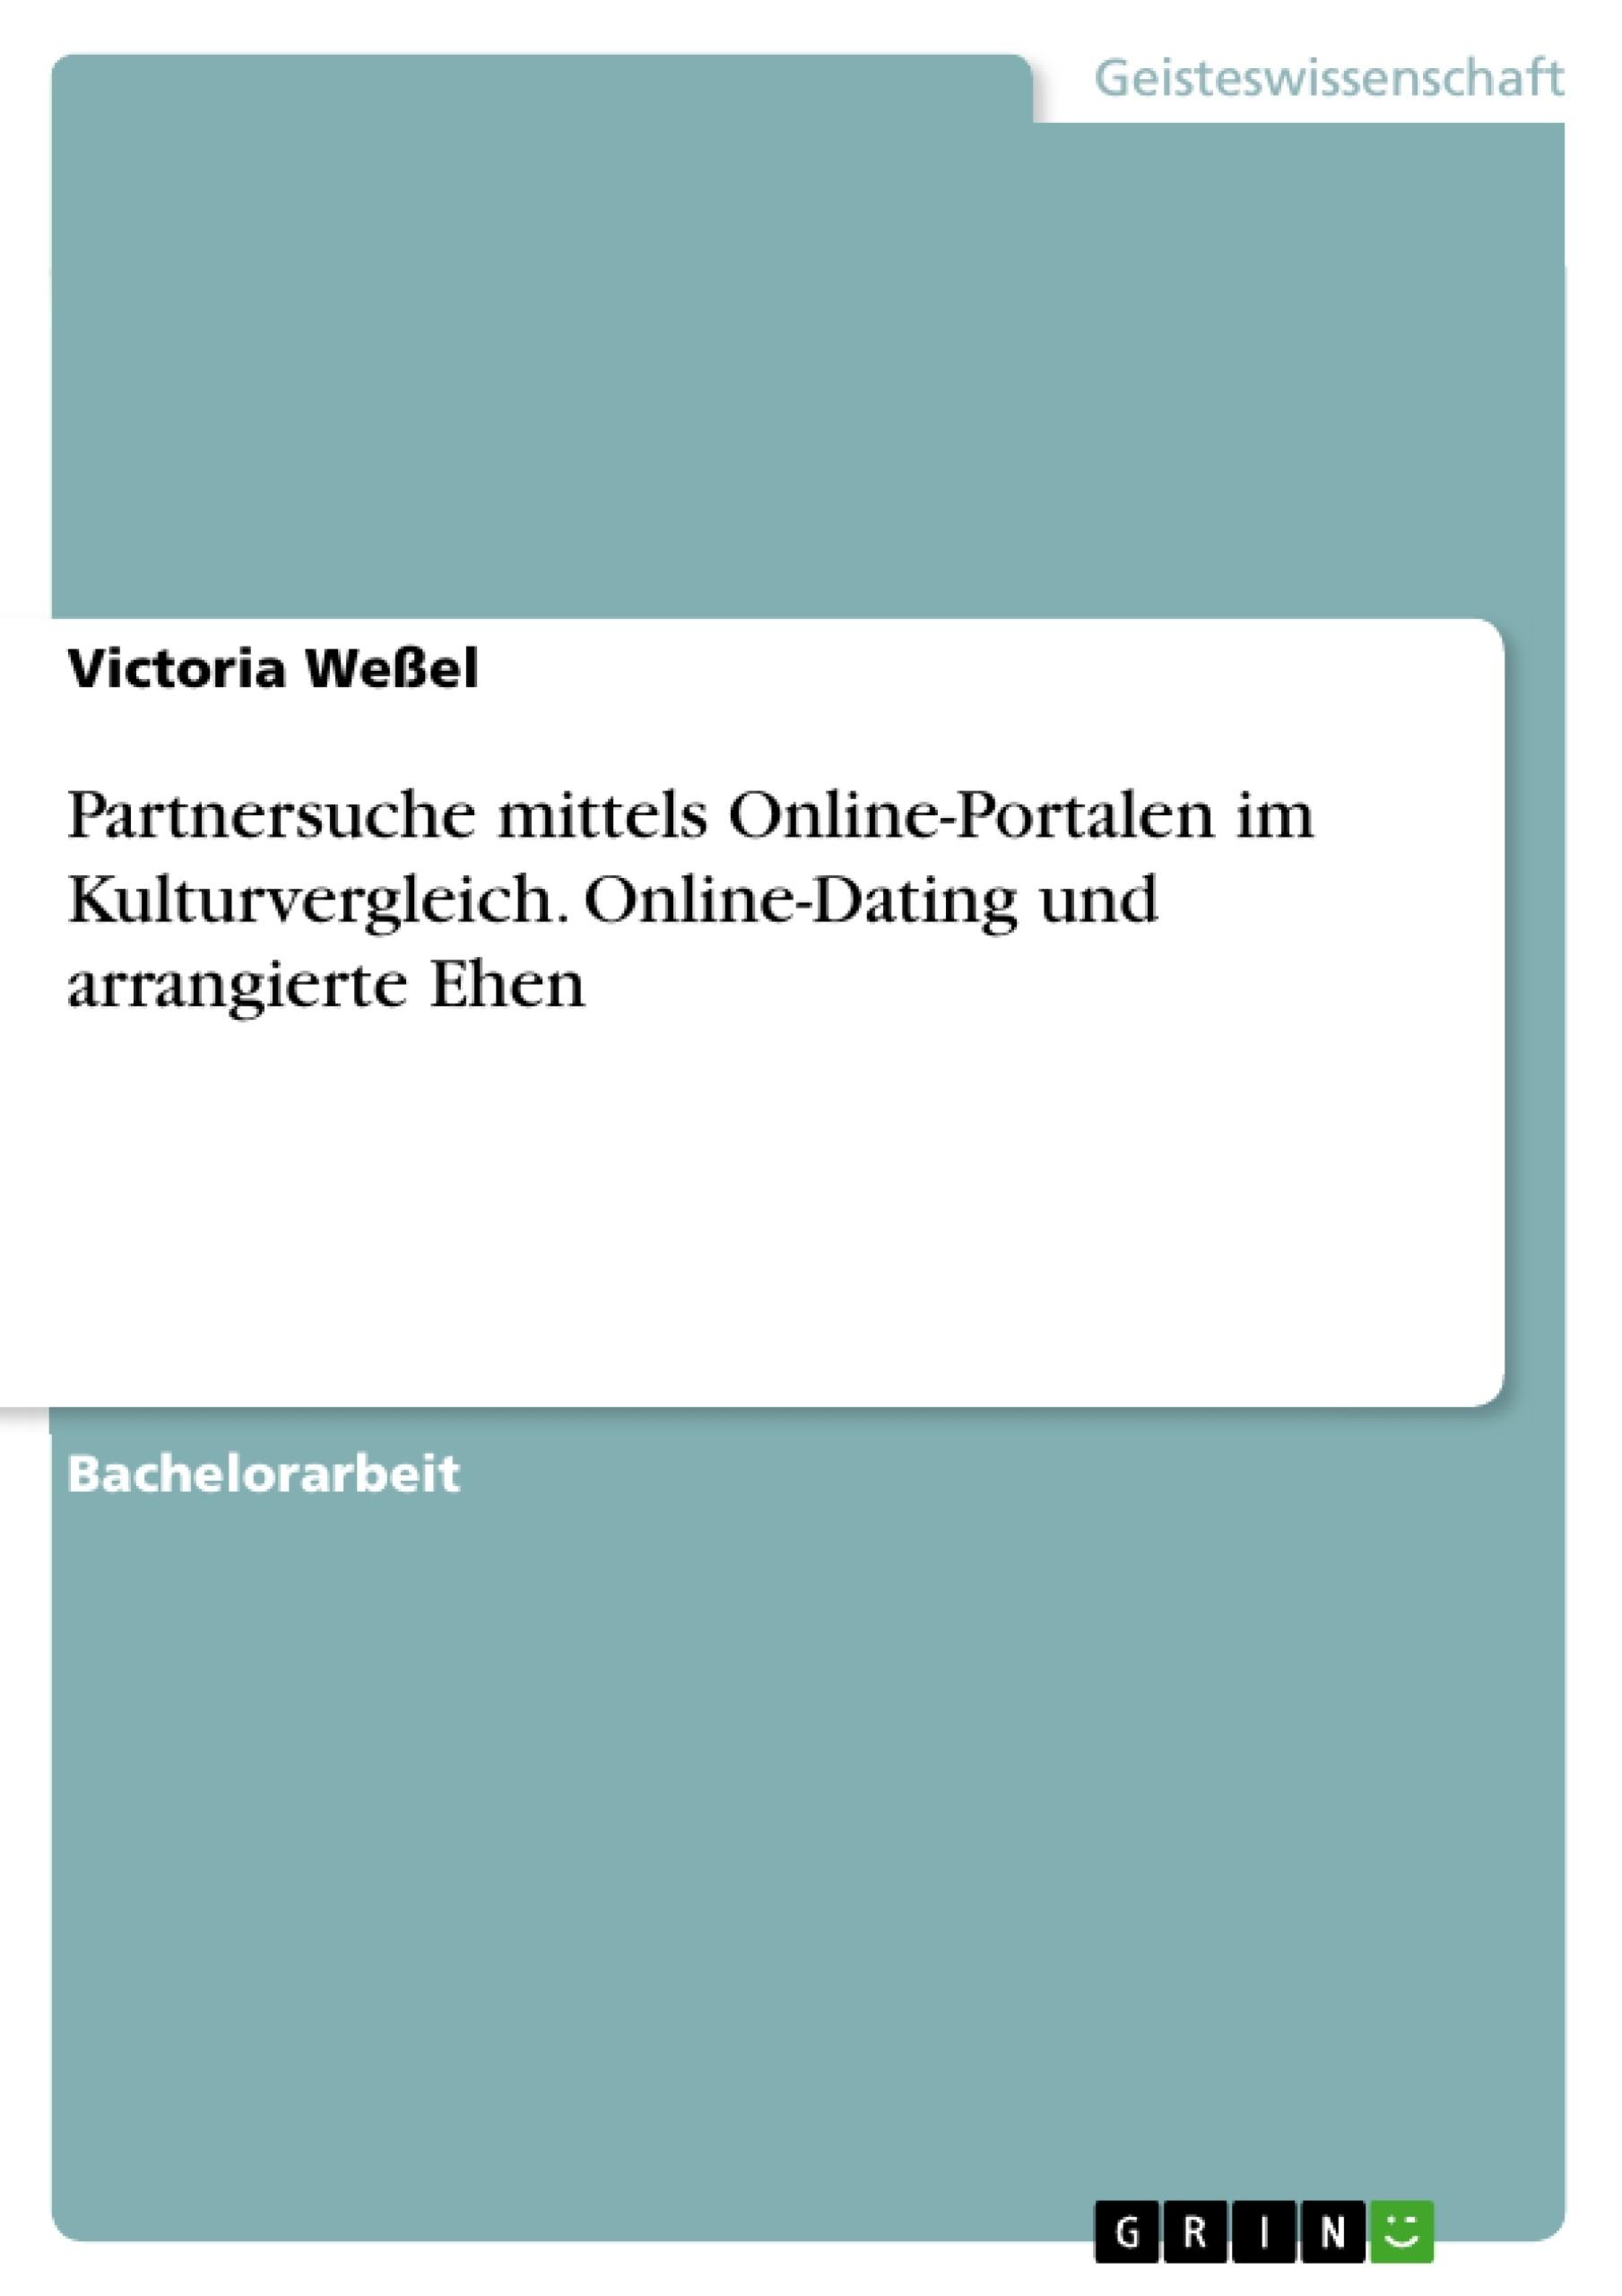 Single online dating